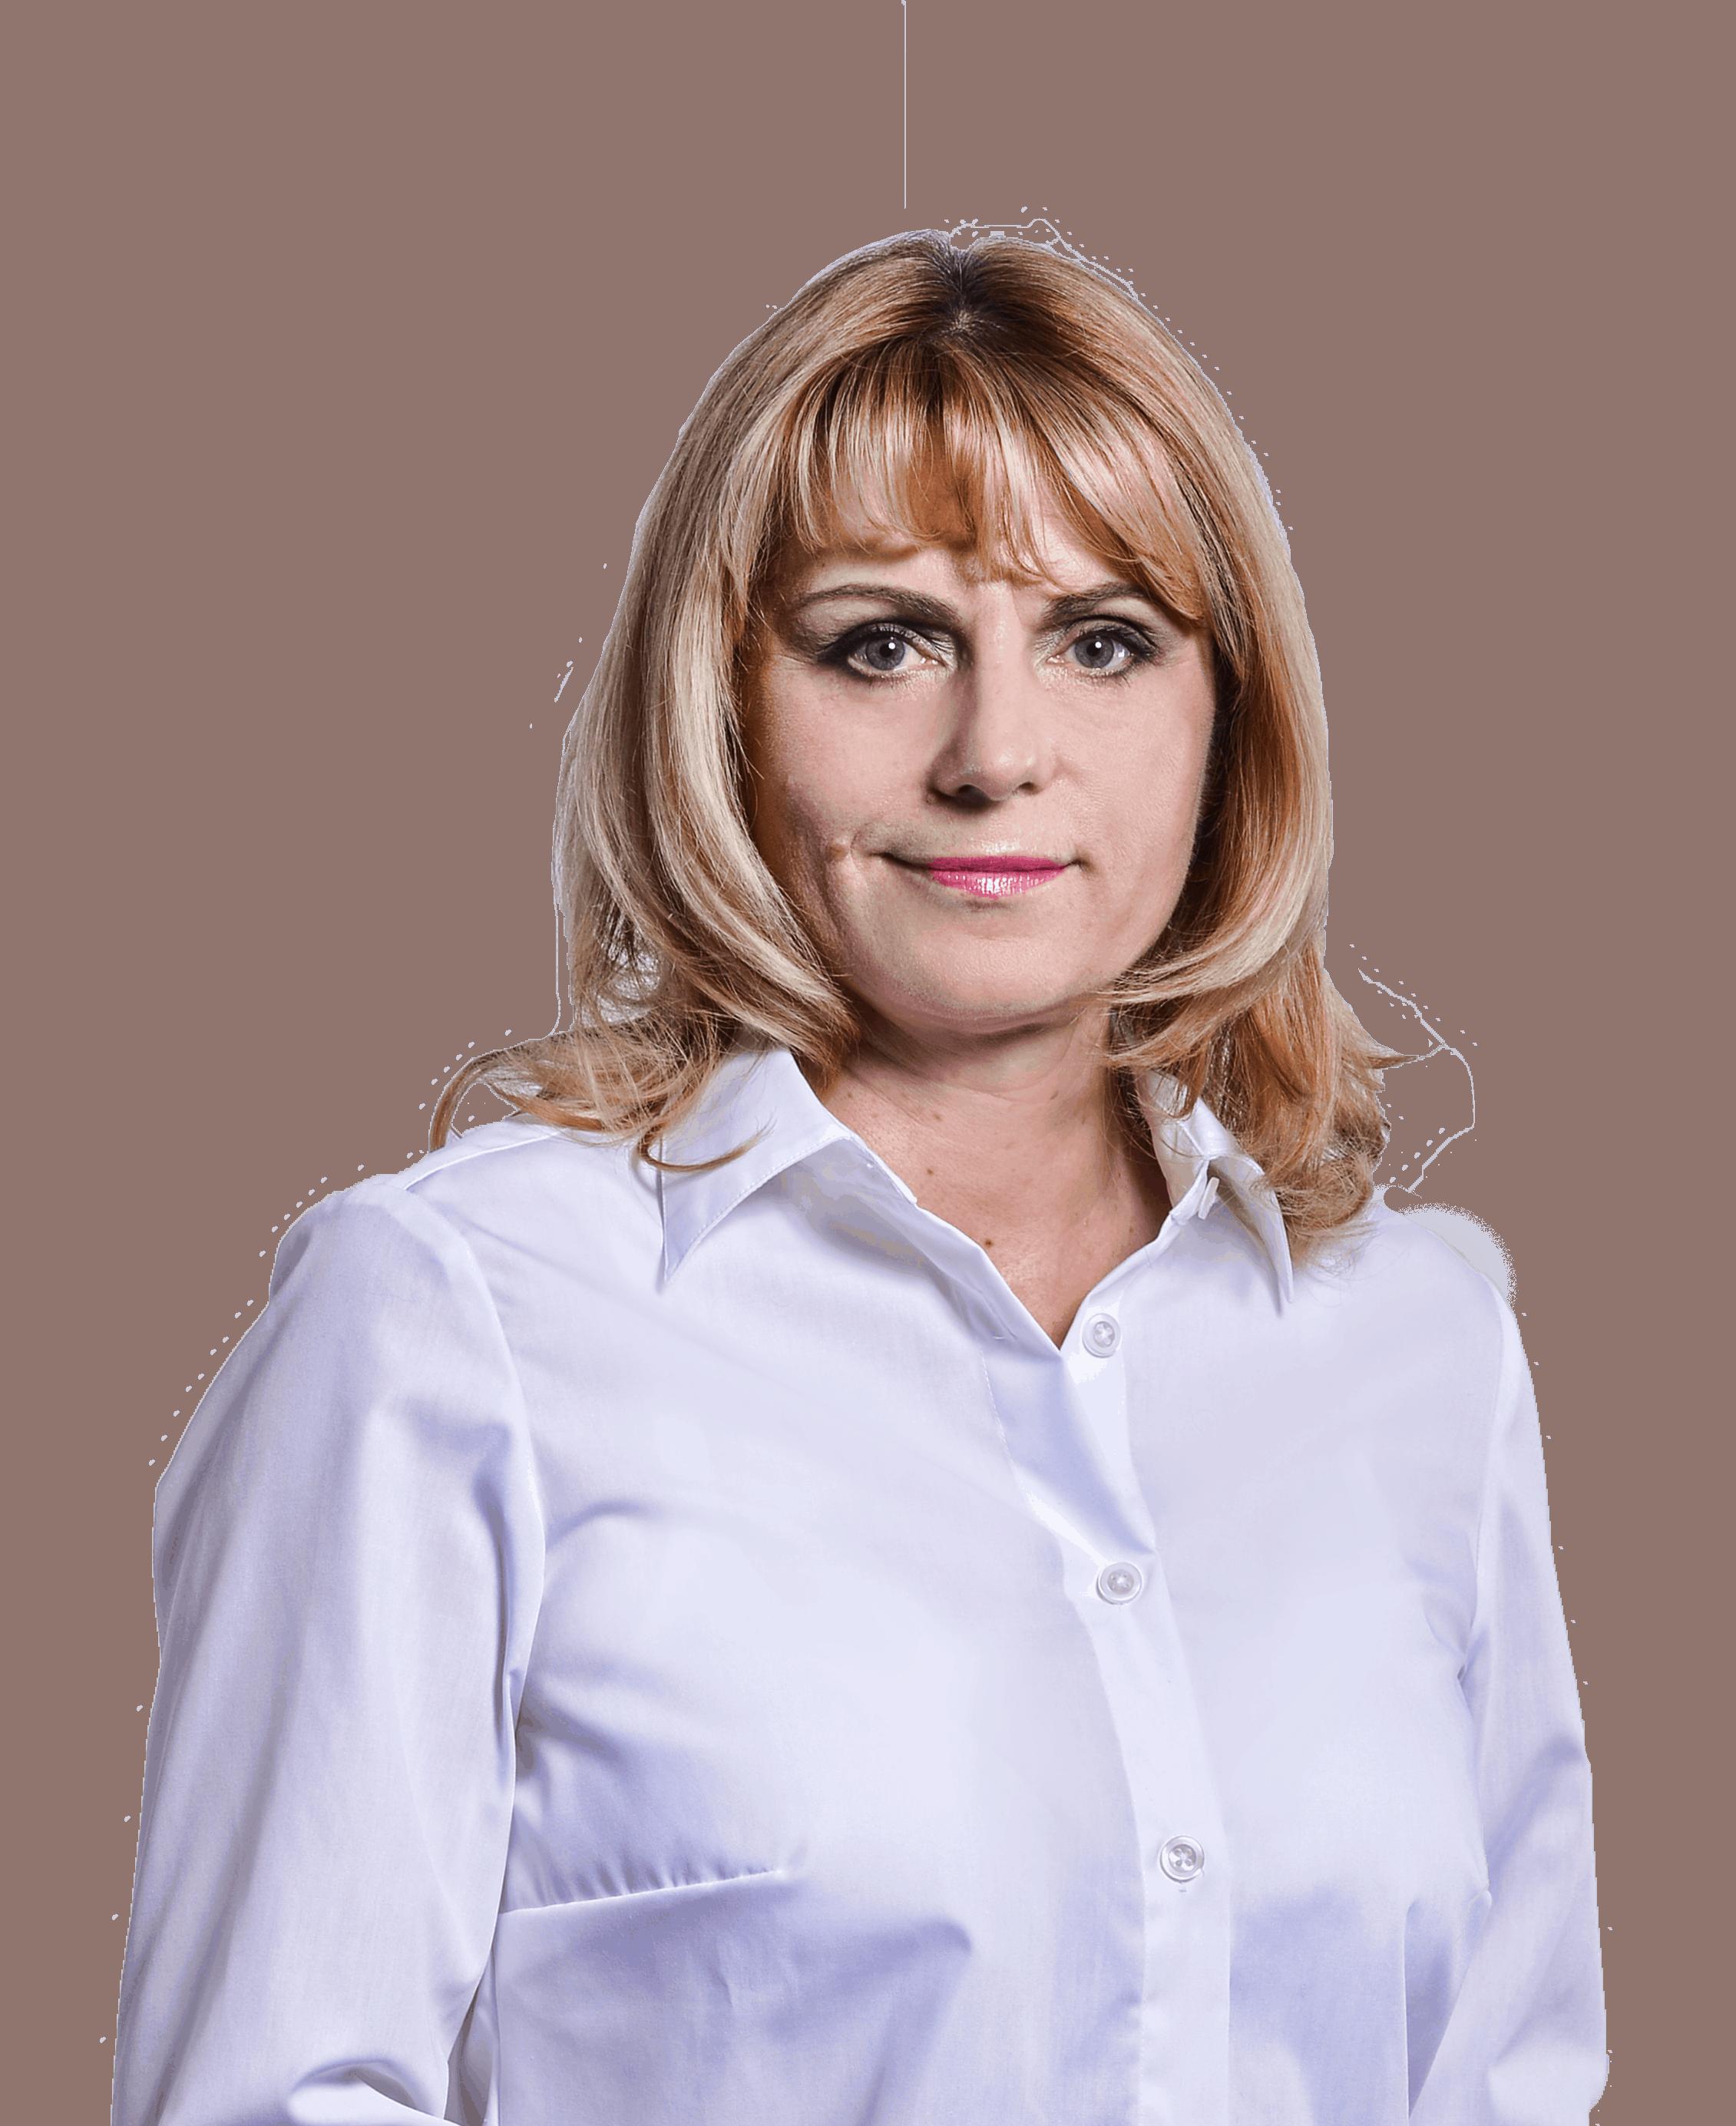 Dr, Iva Thiel, LECTURA CEO